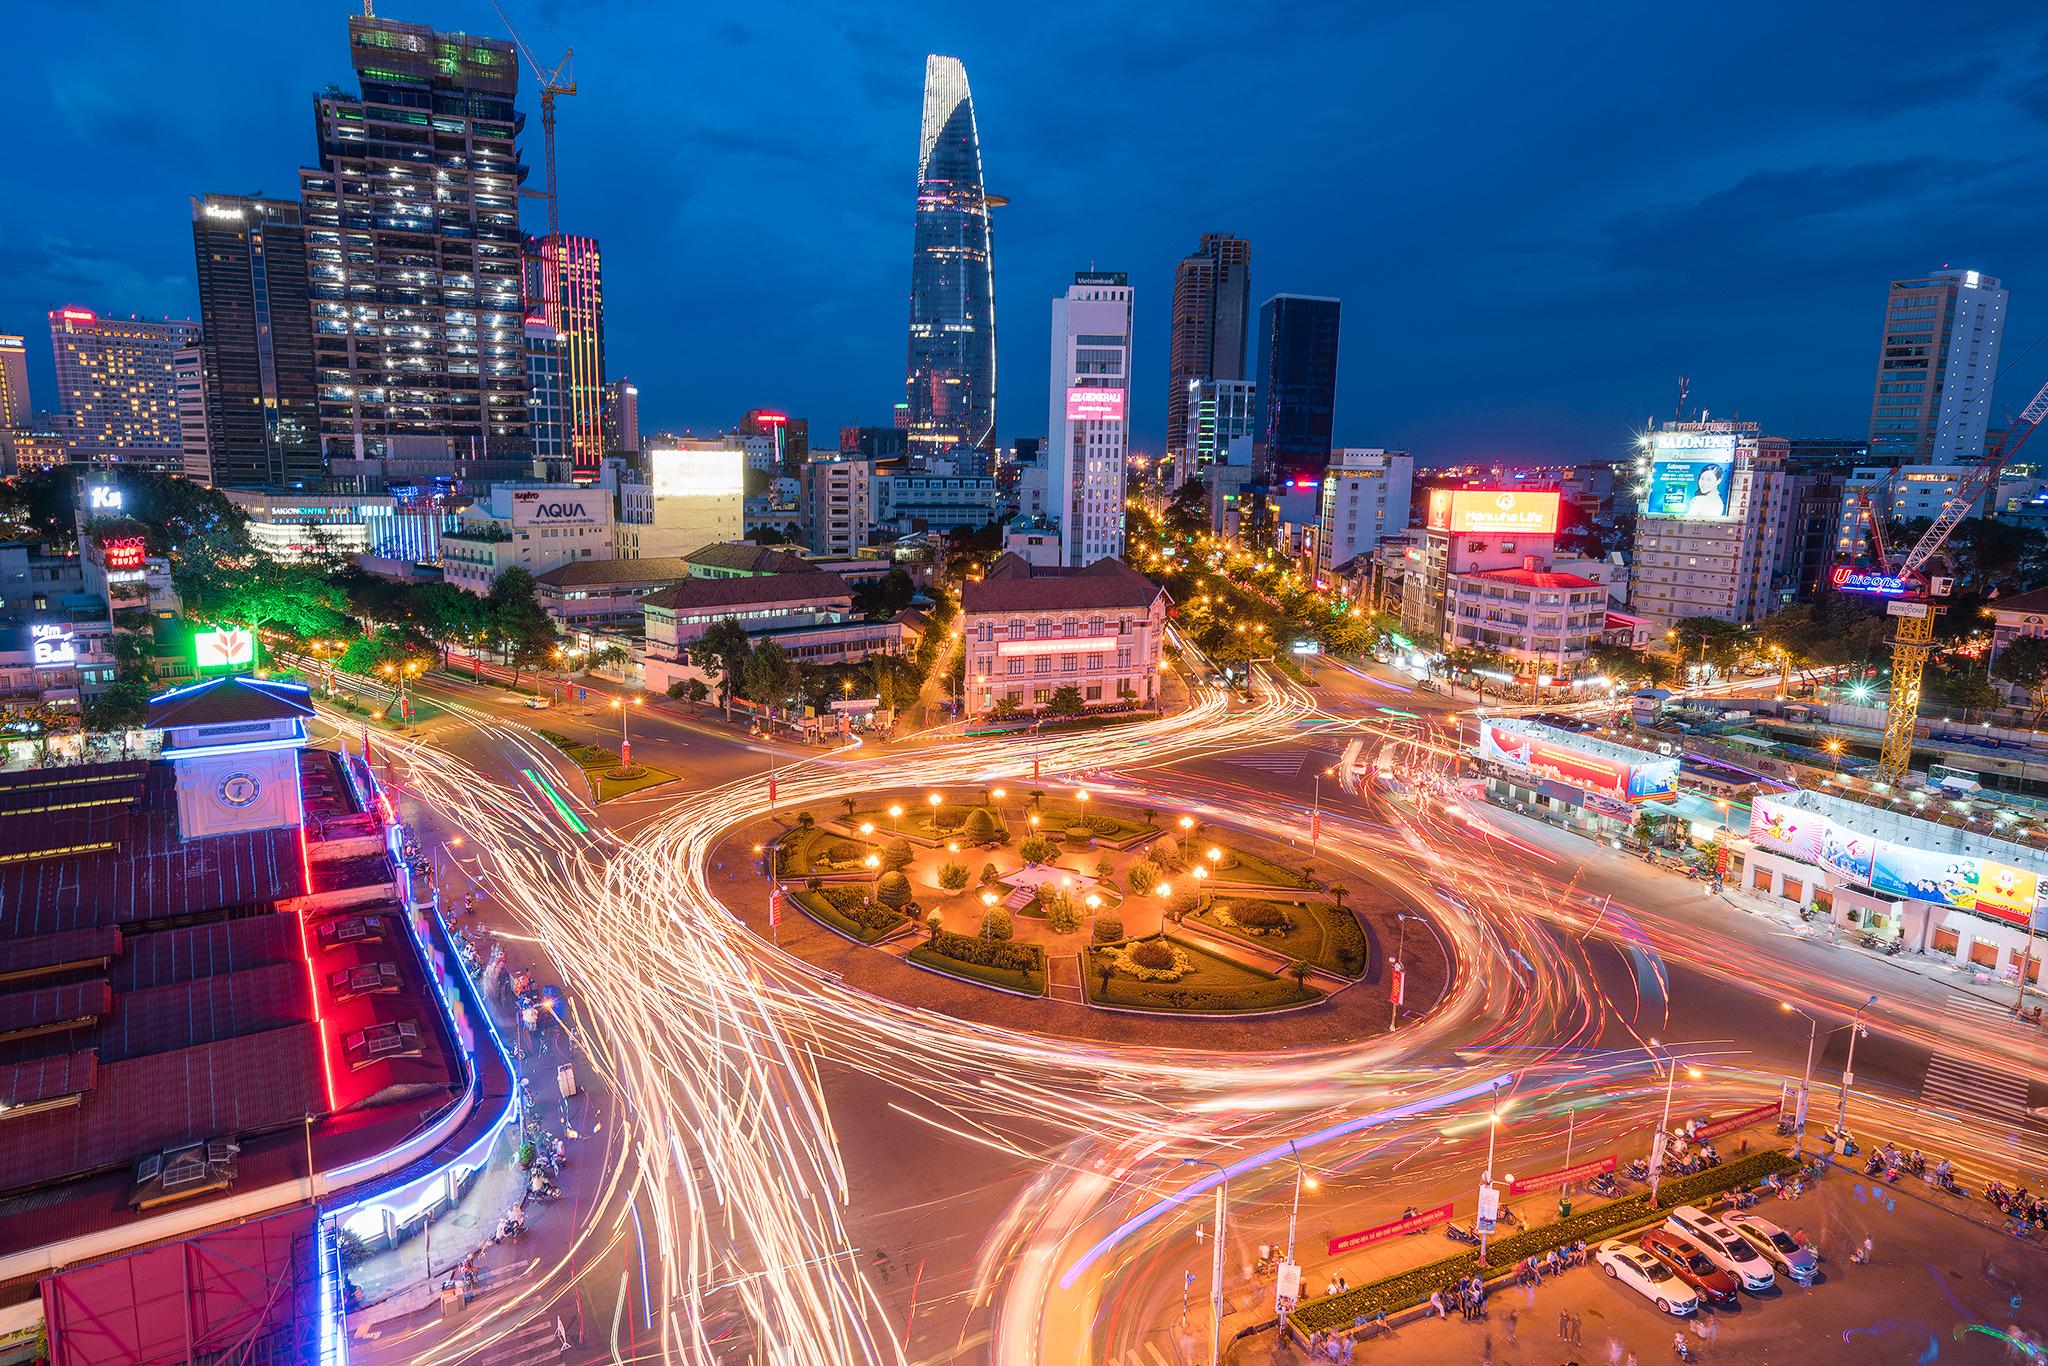 Quach Thi Trang Square, Vietnam